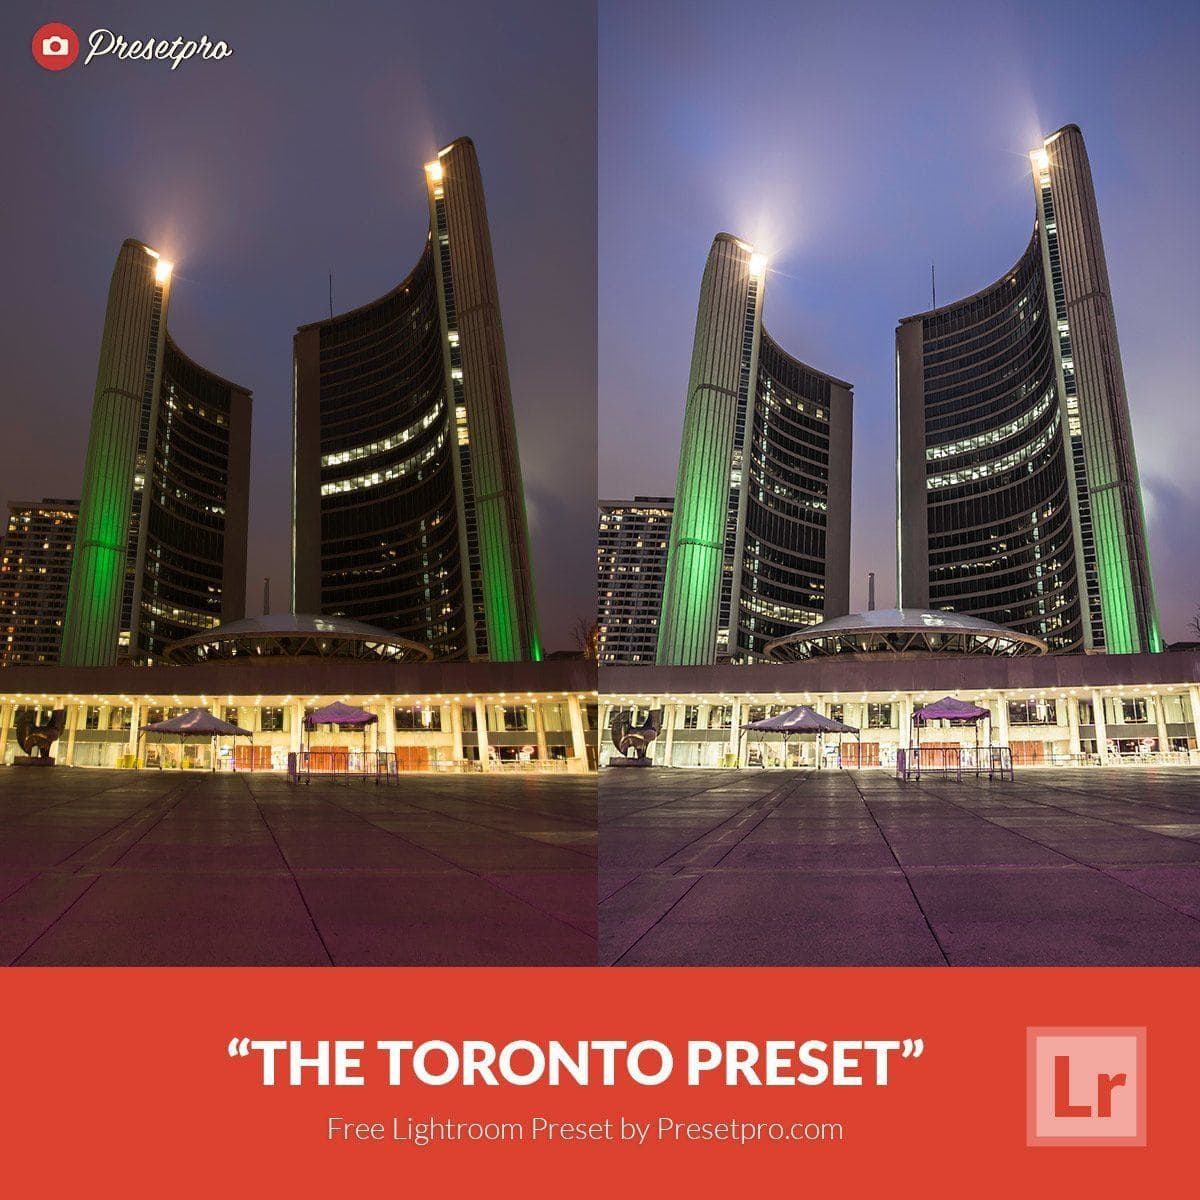 Free-Lightroom-Preset-The-Toronto